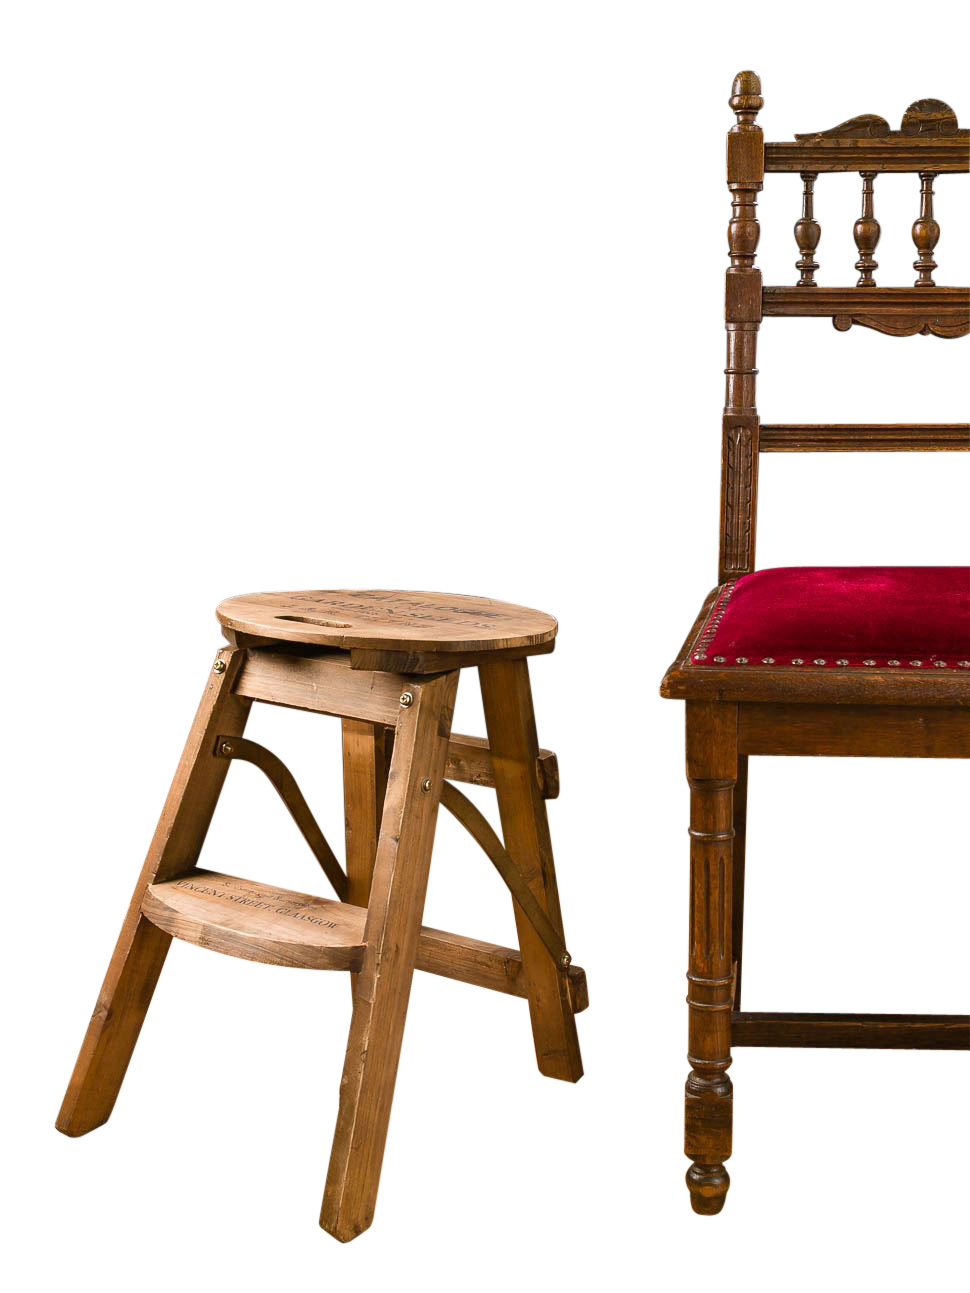 nostalgie blumenhocker holz blumenbank pflanztreppe tisch hocker antik stil ebay. Black Bedroom Furniture Sets. Home Design Ideas